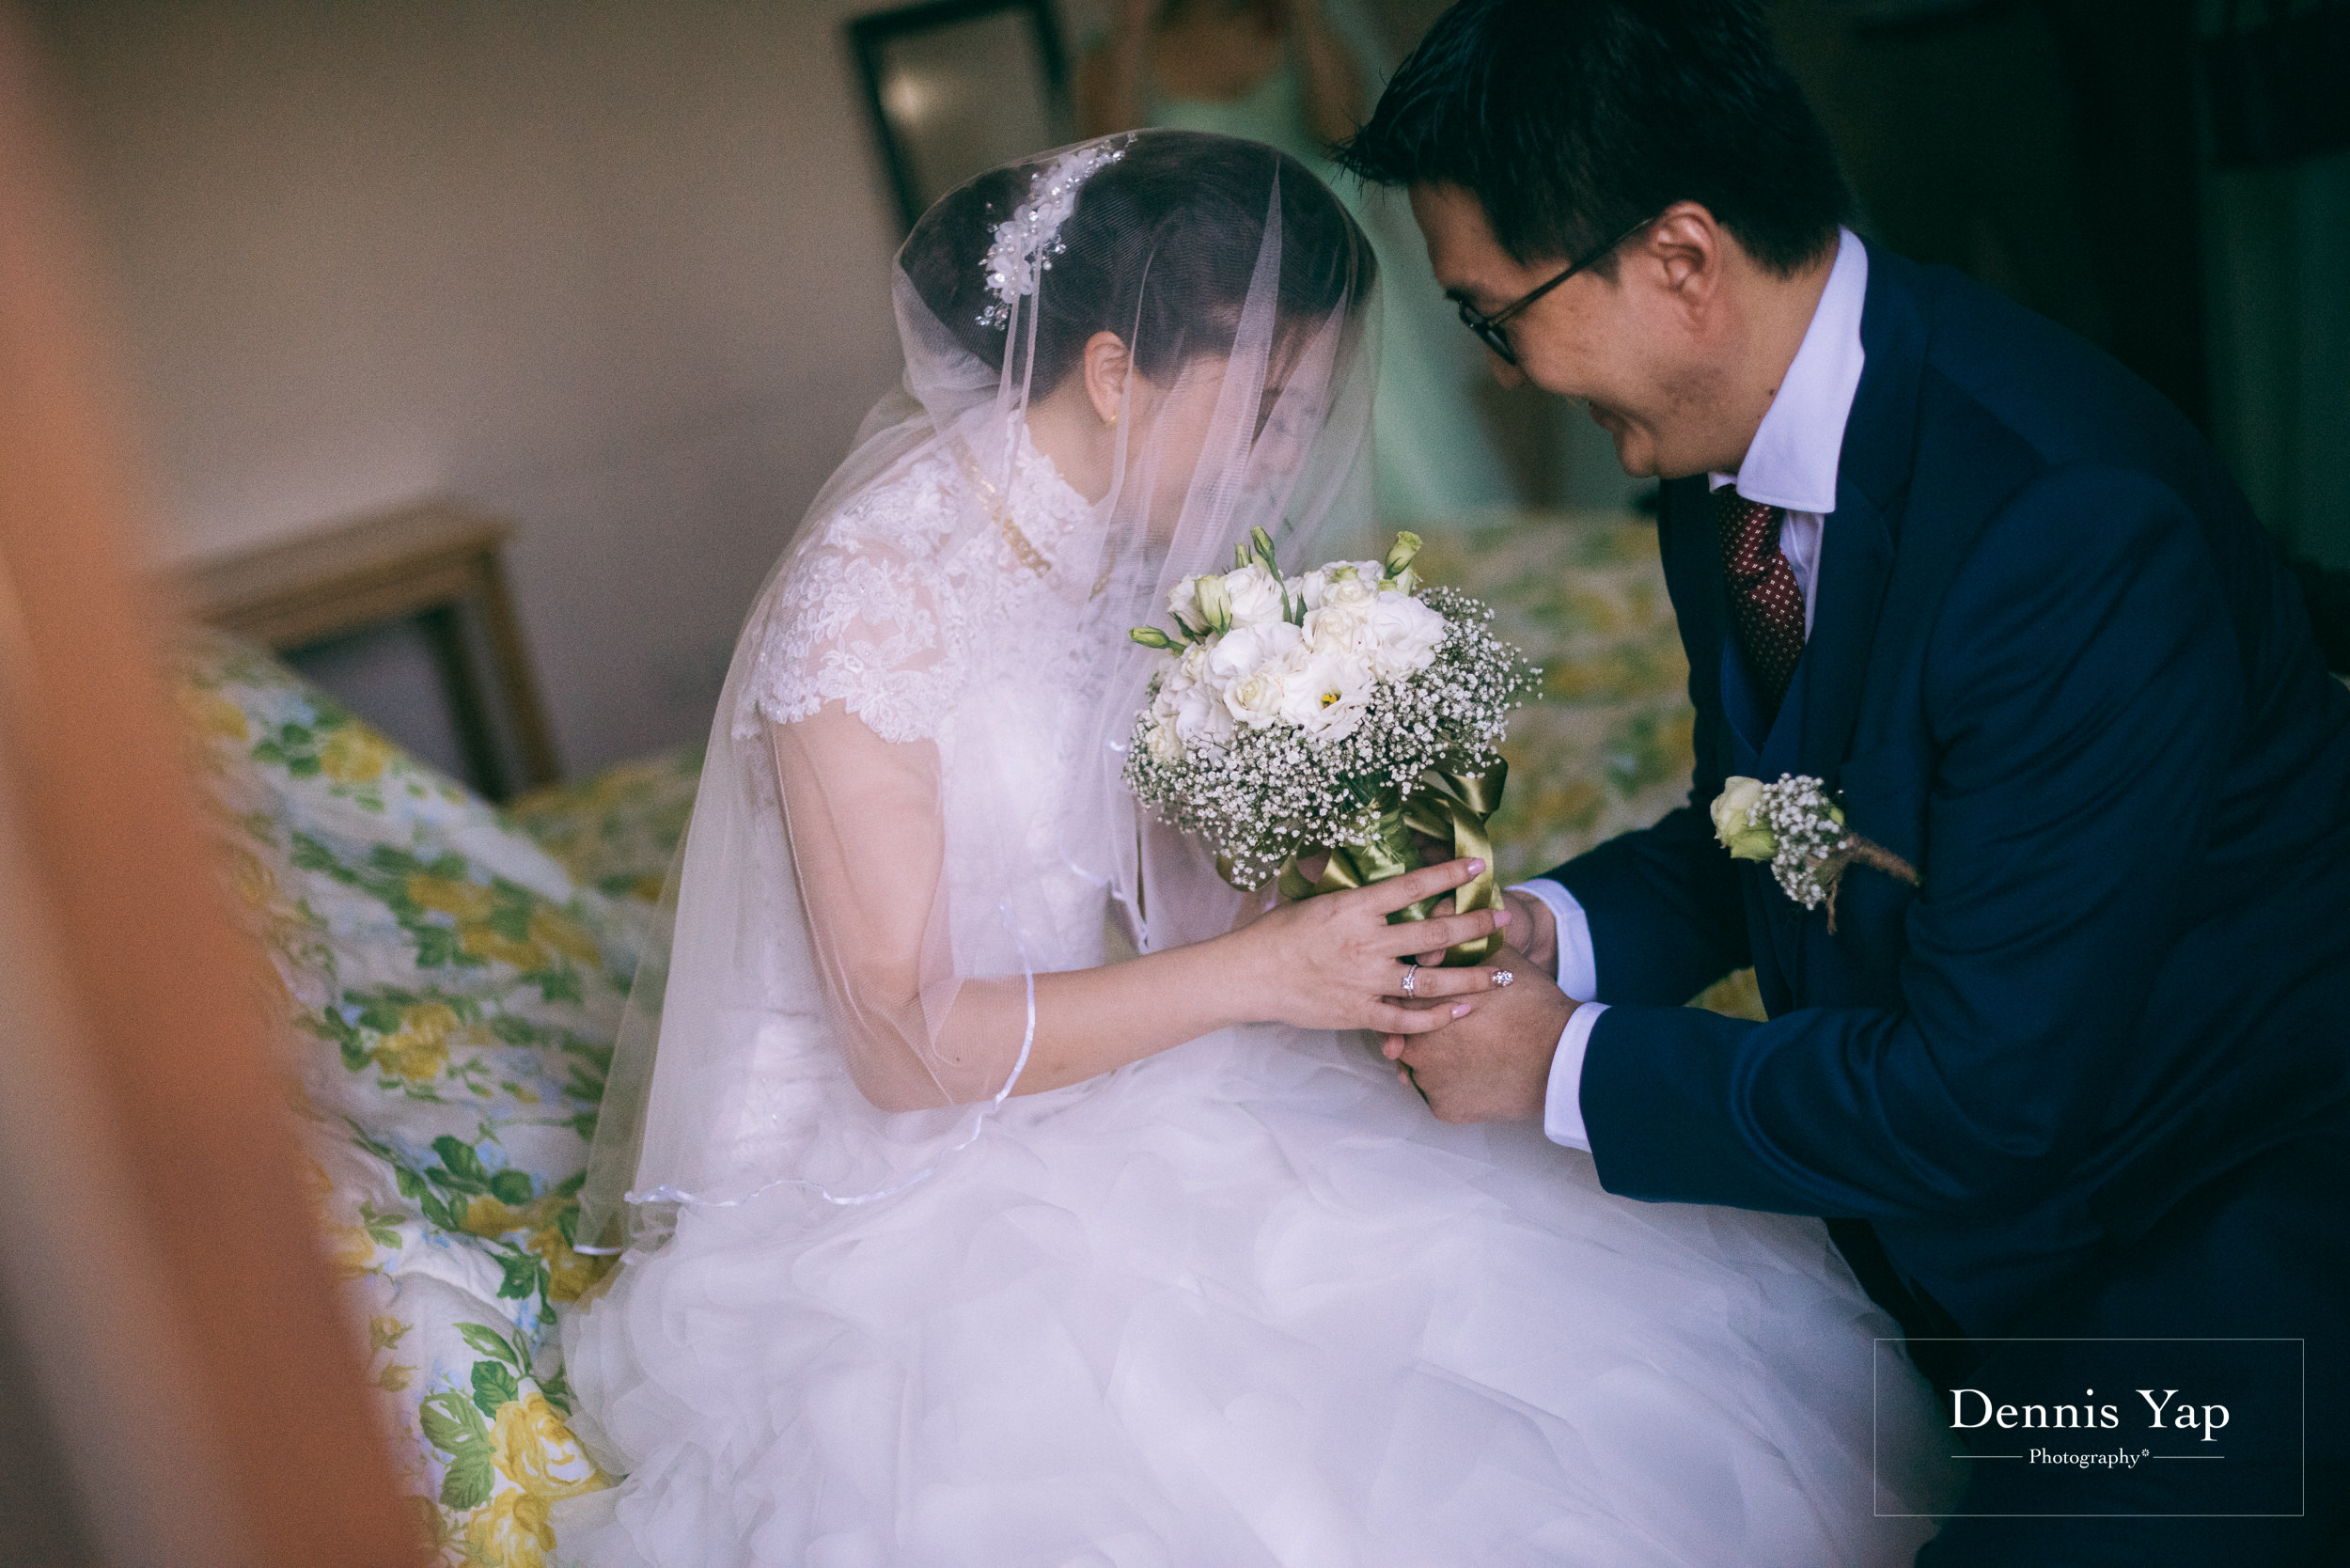 kok jin hooi woon wedding day klang dennis yap photography-8.jpg